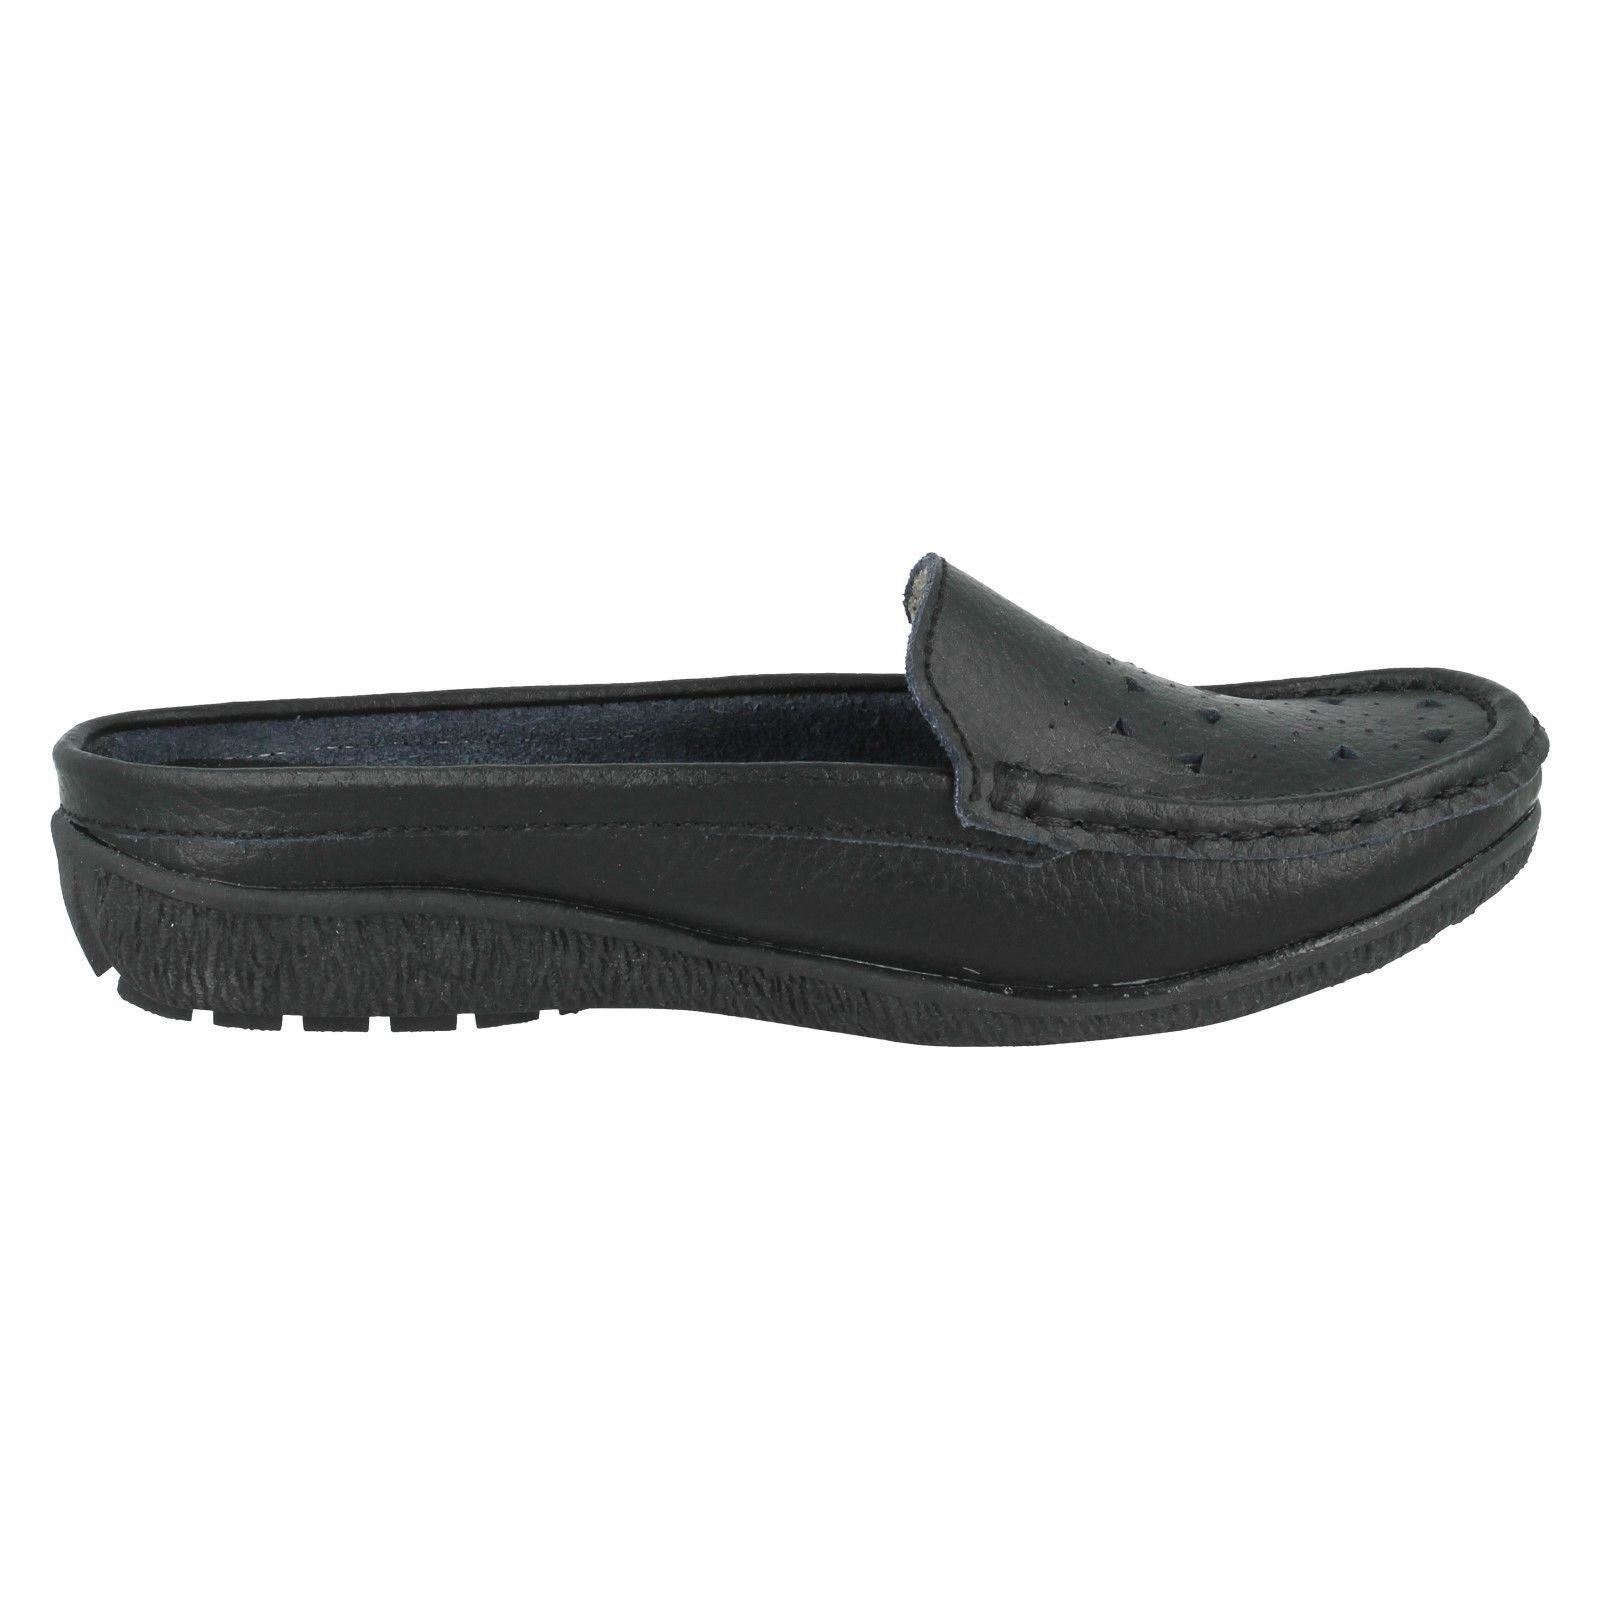 eaze leather slip on backless mule shoes f3102 ebay